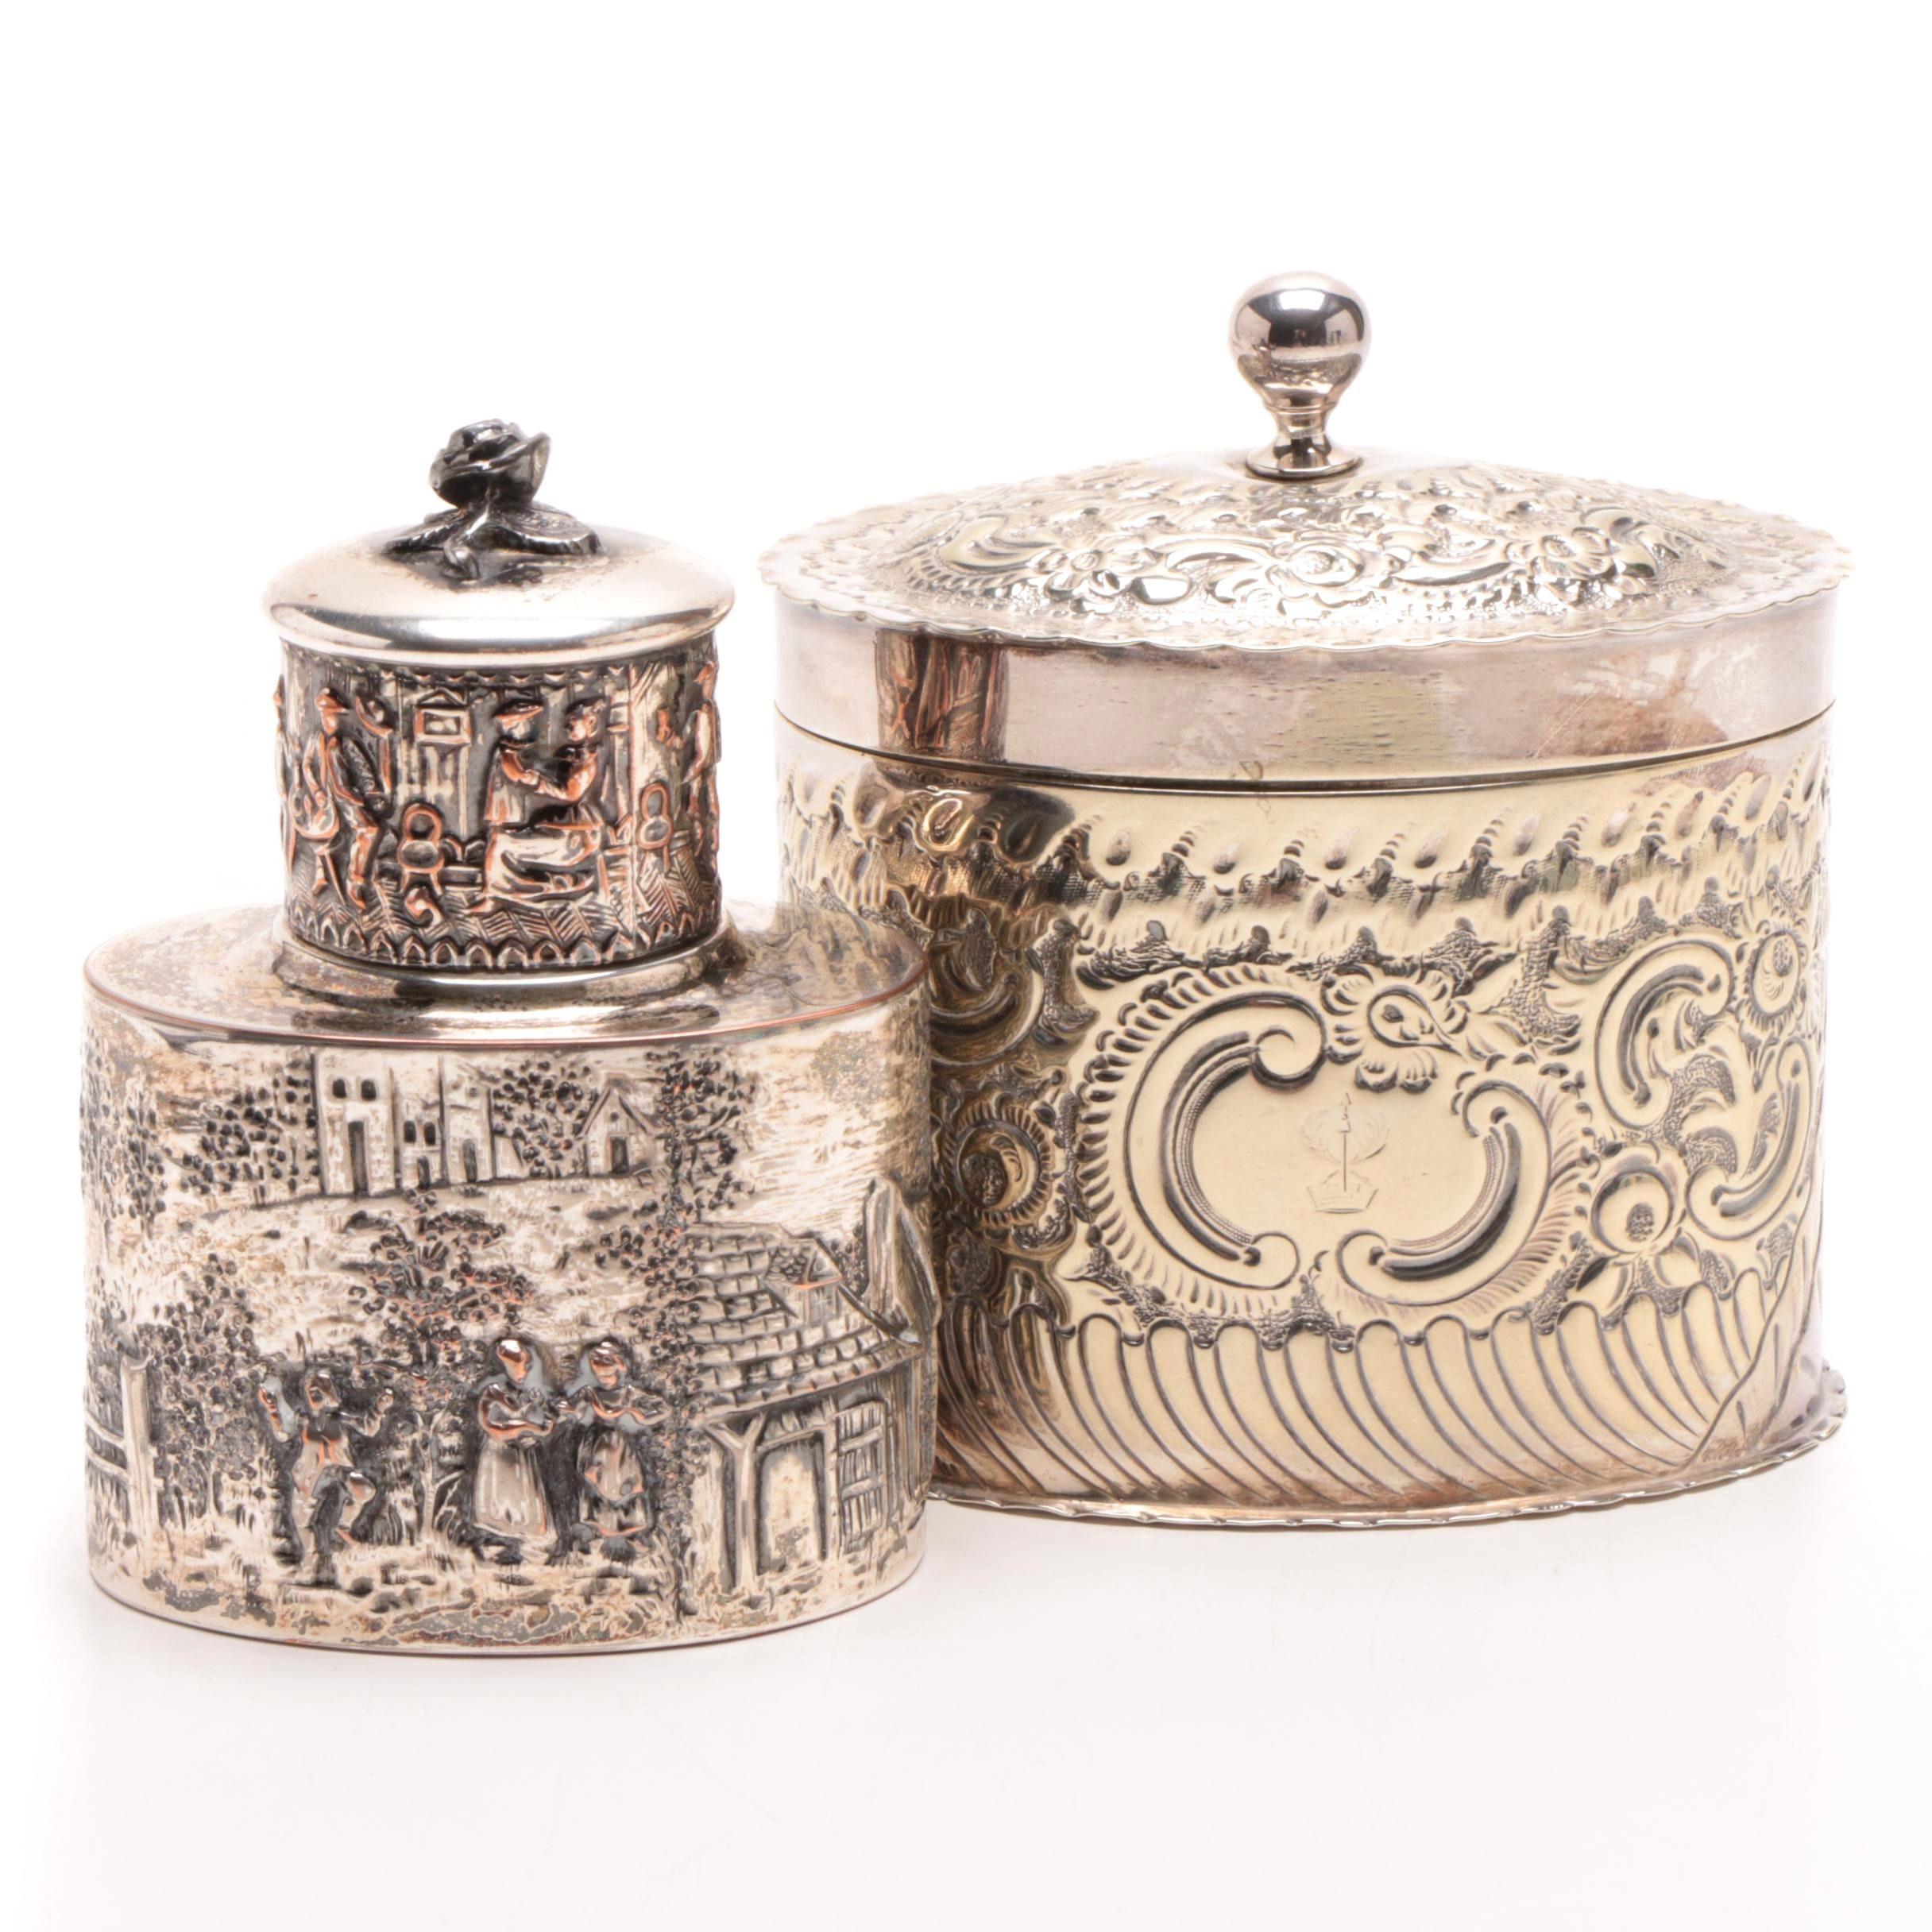 Embossed Antique Silver Plate Tea Caddies